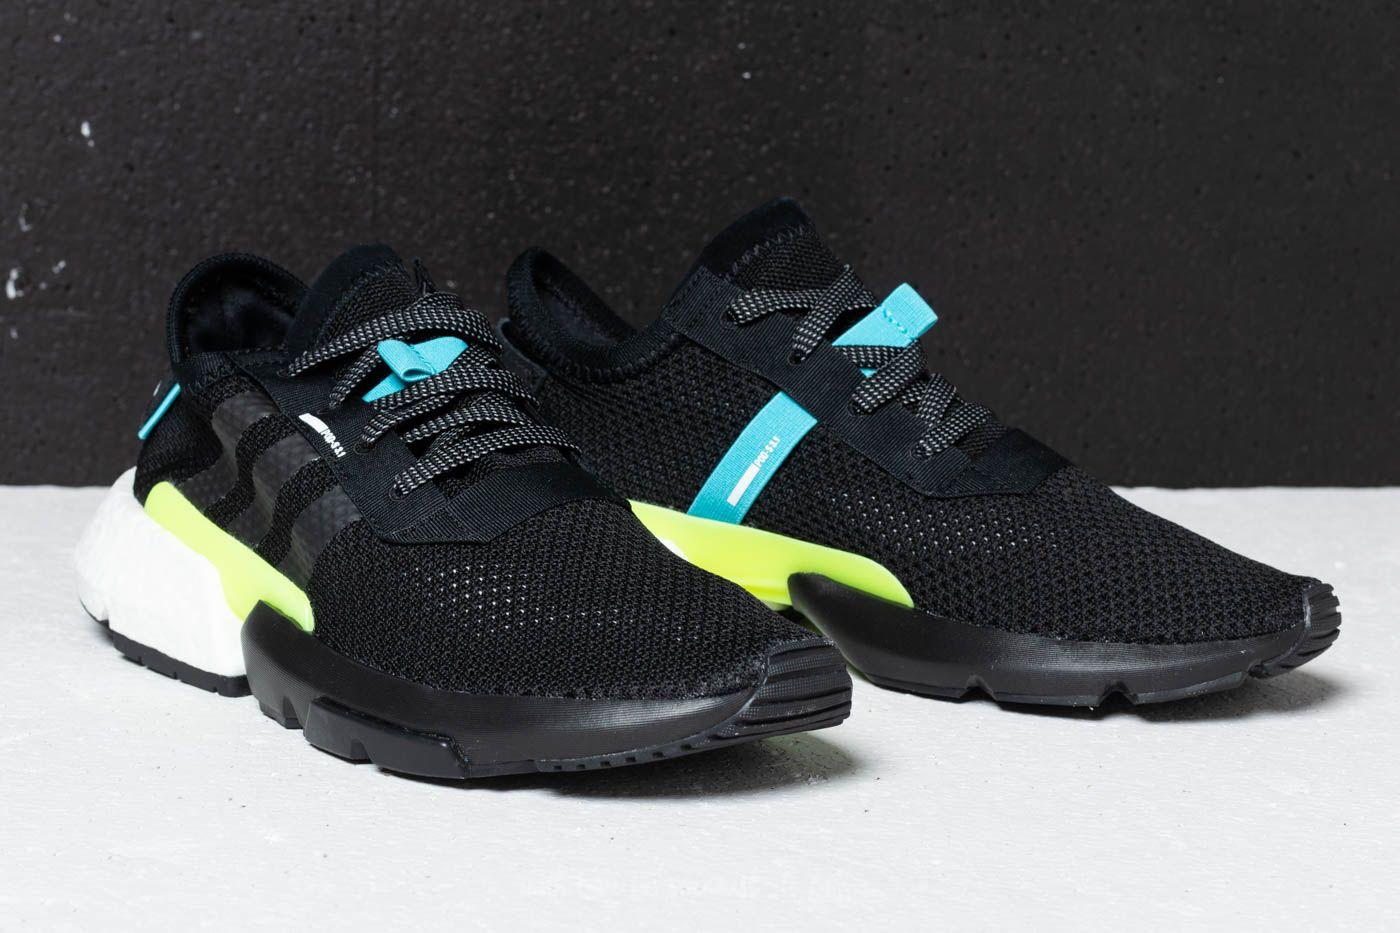 super popular 8a90a fc724 adidas POD-S3.1 Core Black Core Black Ftw White at a